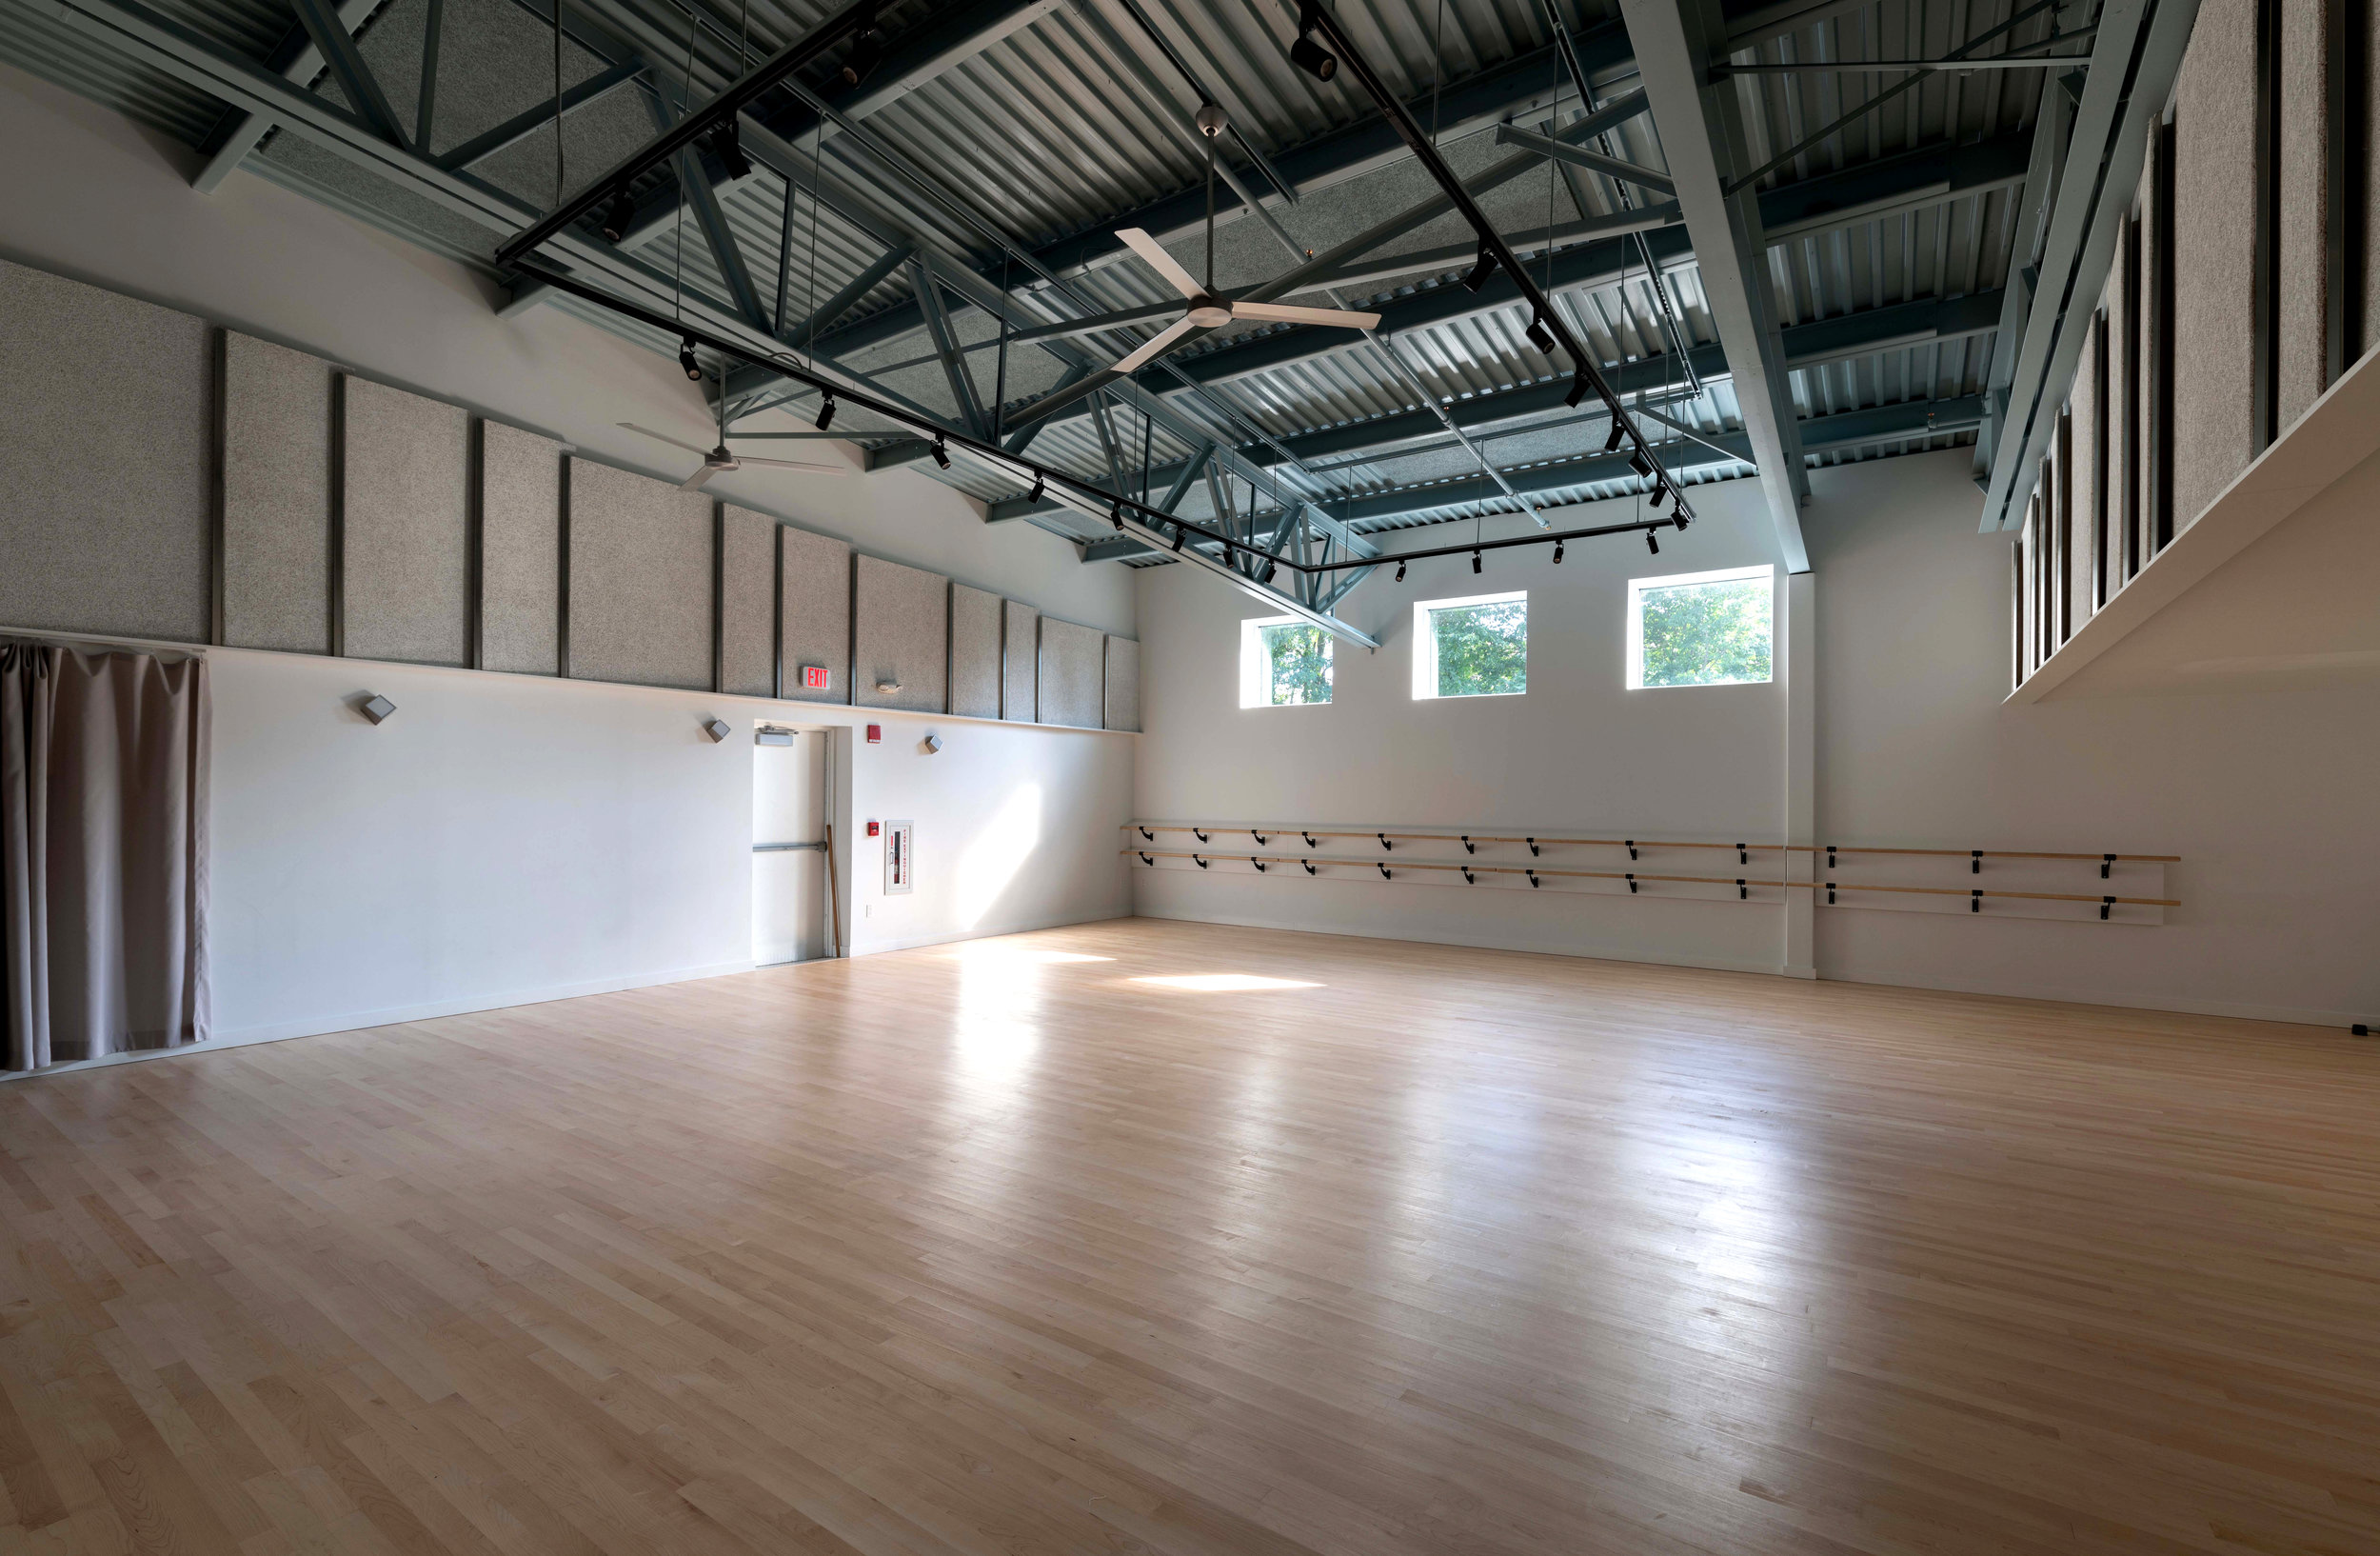 Dance Studio wide angle-8e (Held)e.jpg